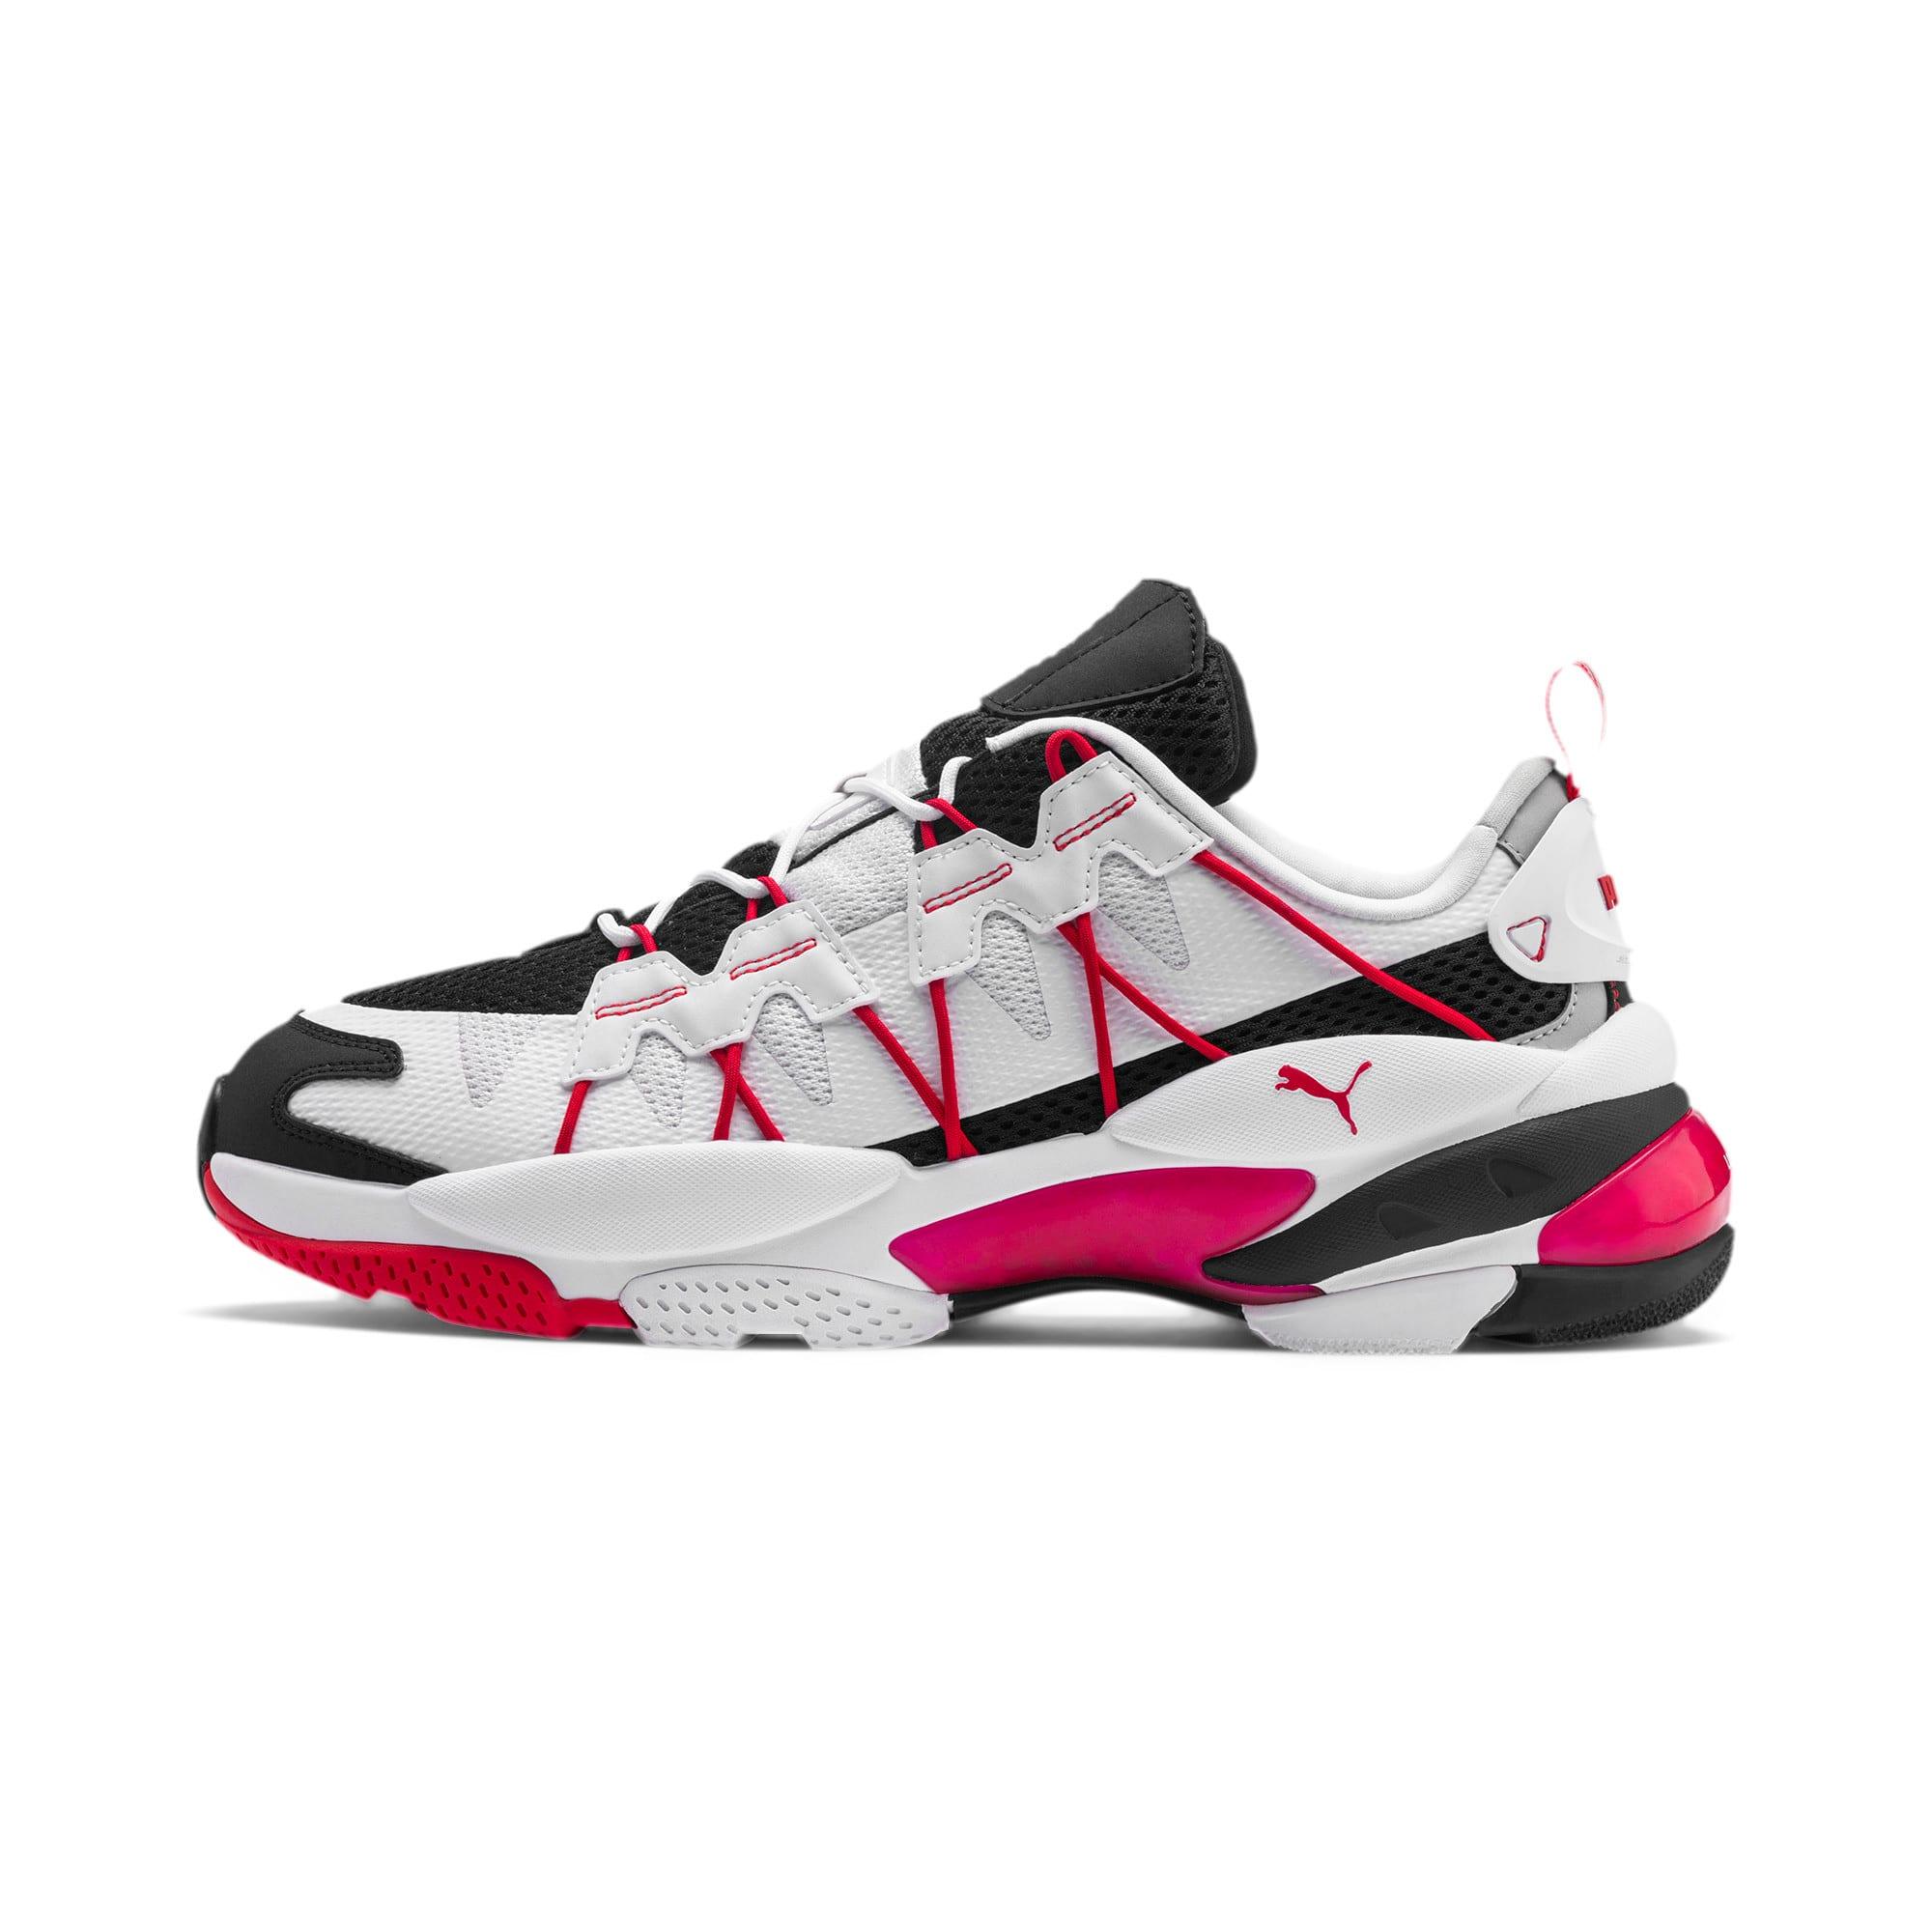 Thumbnail 1 of LQDCELL Omega Training Shoes, Puma Black-Puma White, medium